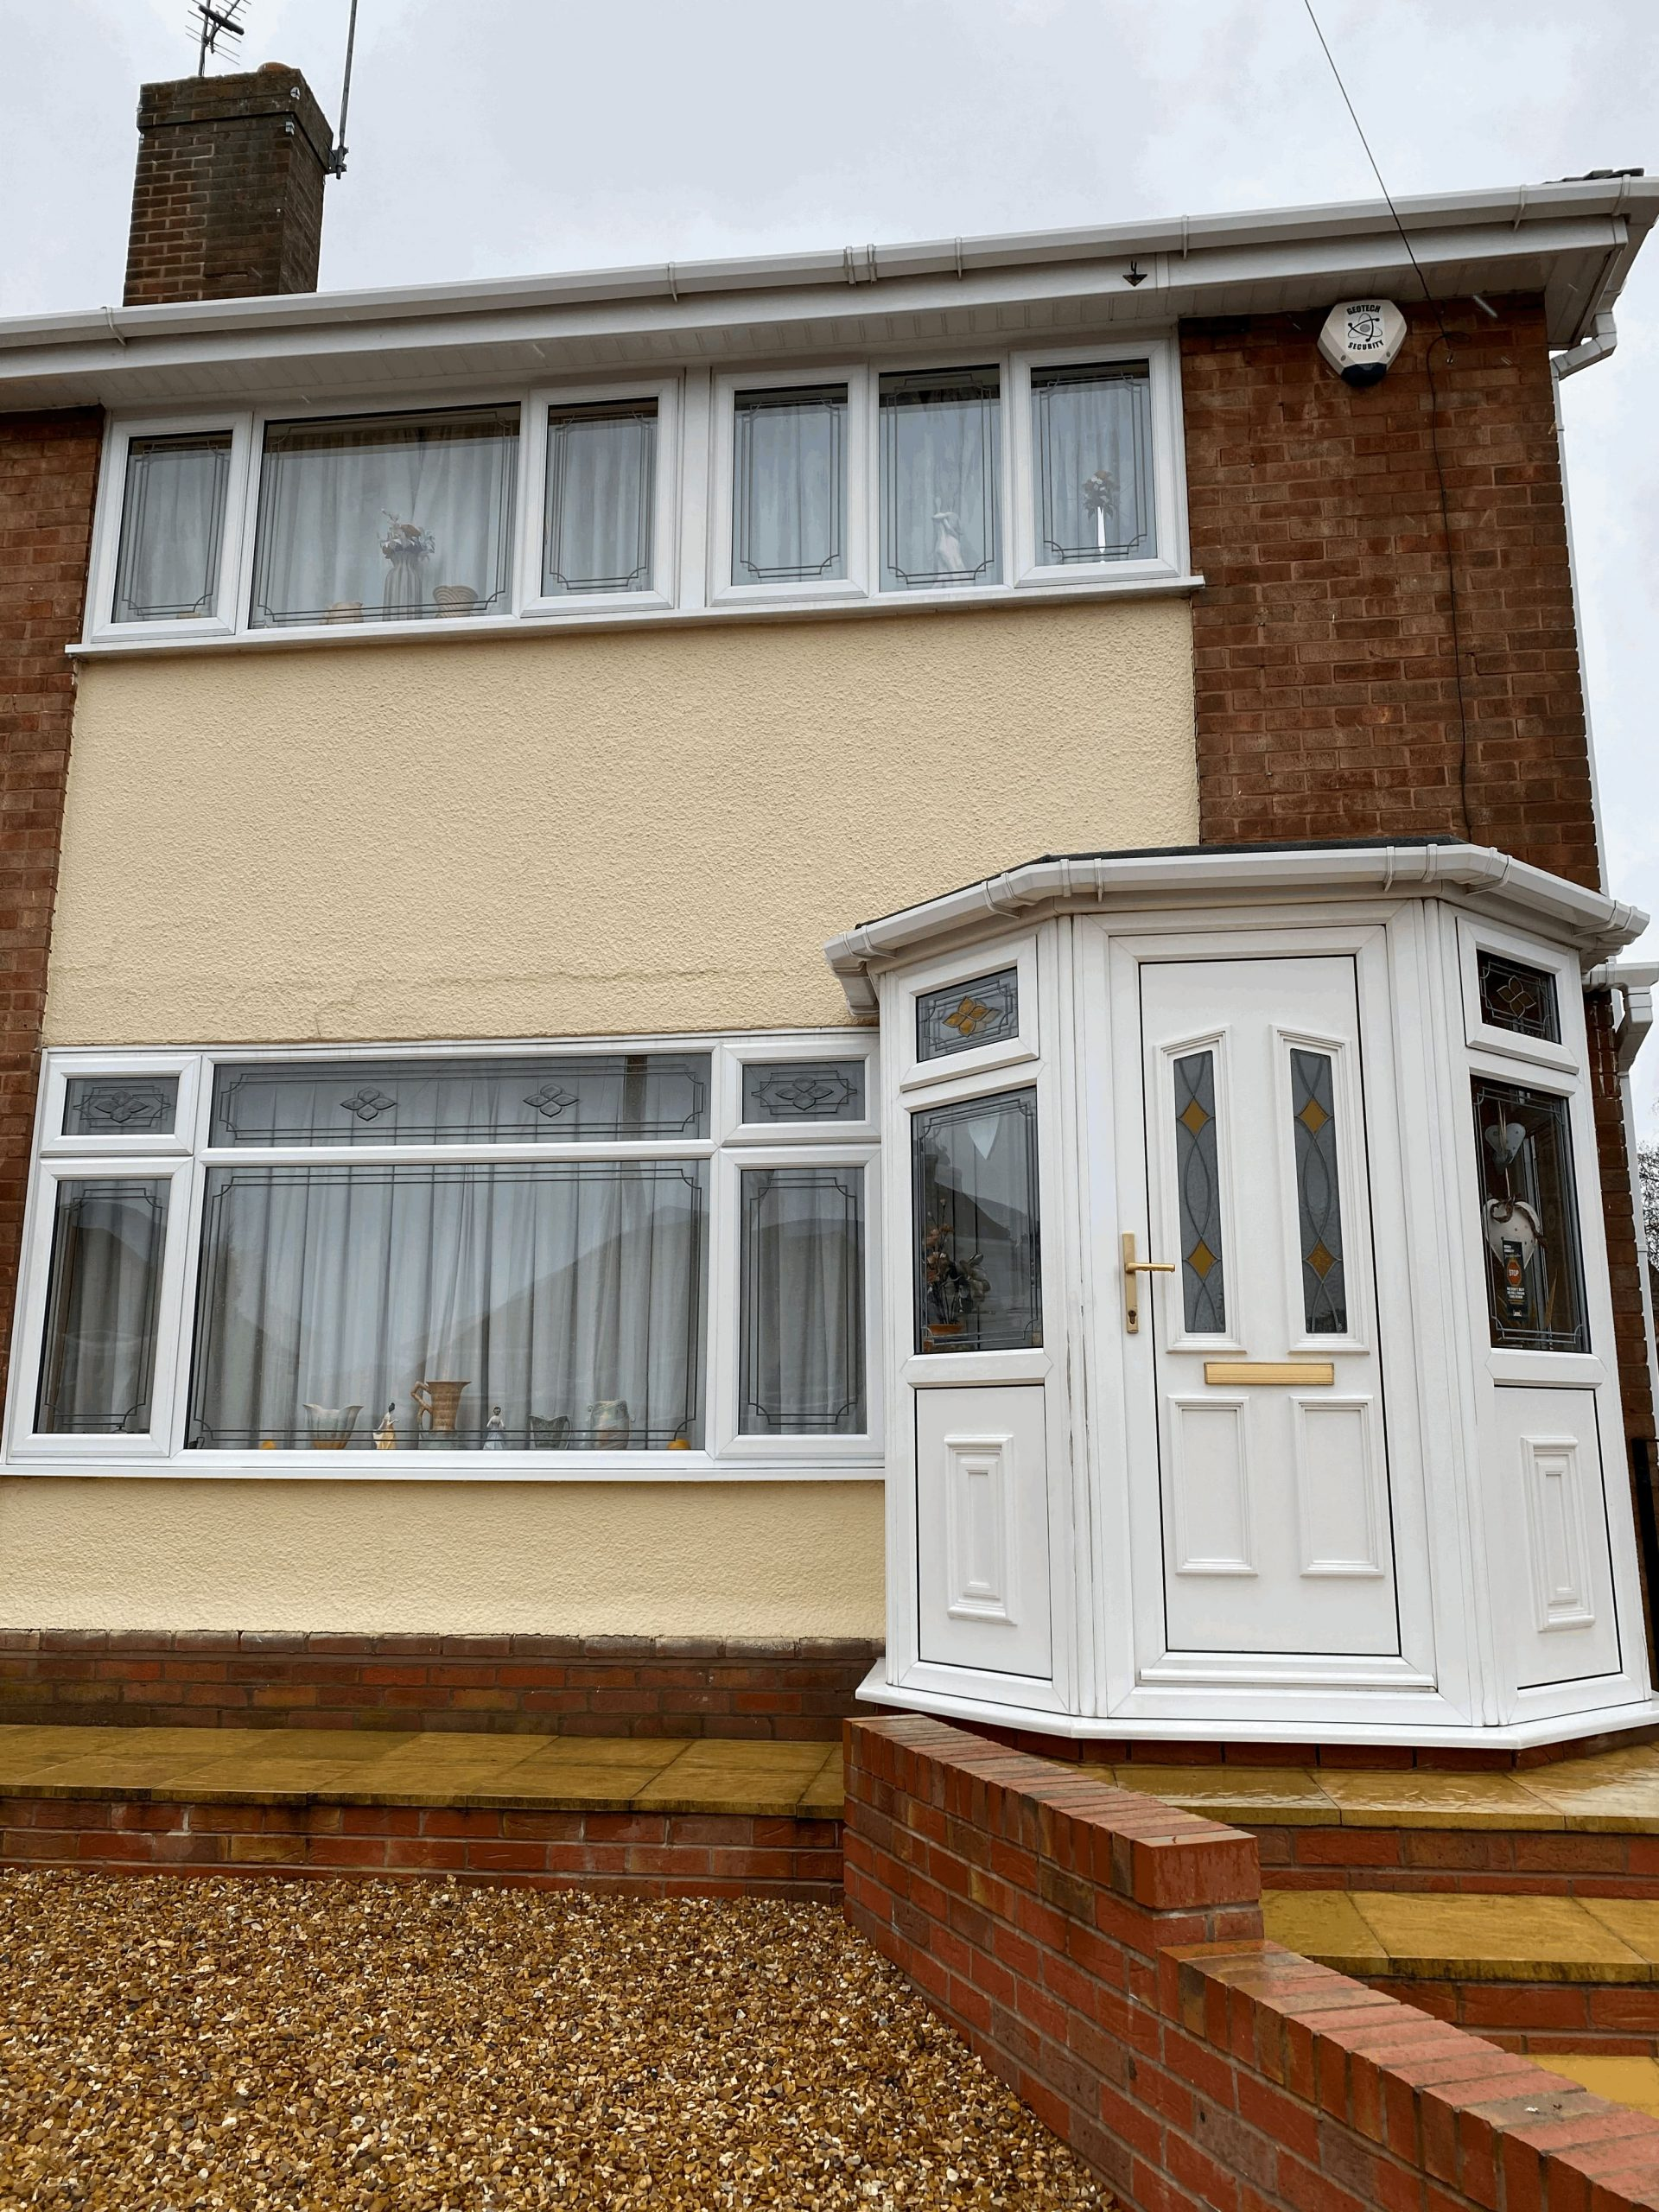 window cleaner wolverhampton area